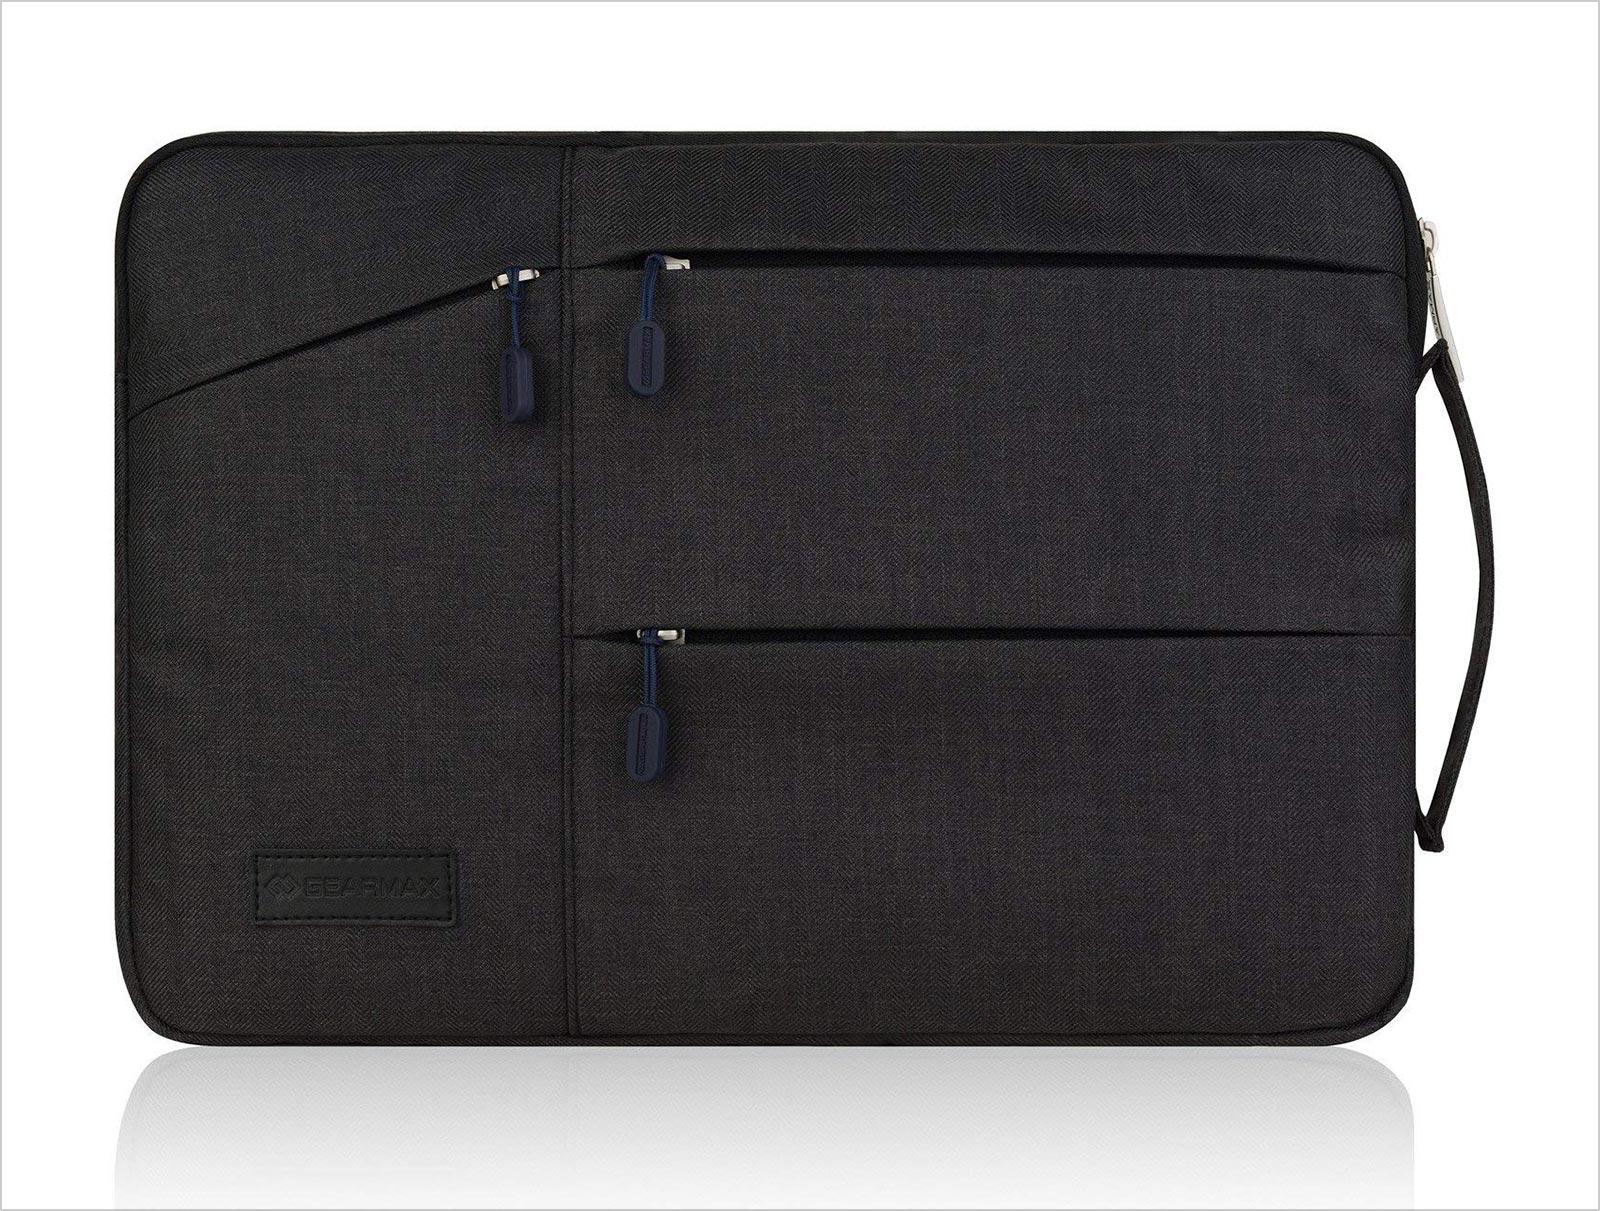 Handbag-for-13-3-Inch-Macbook-Air-&-iPad-Pro-2018